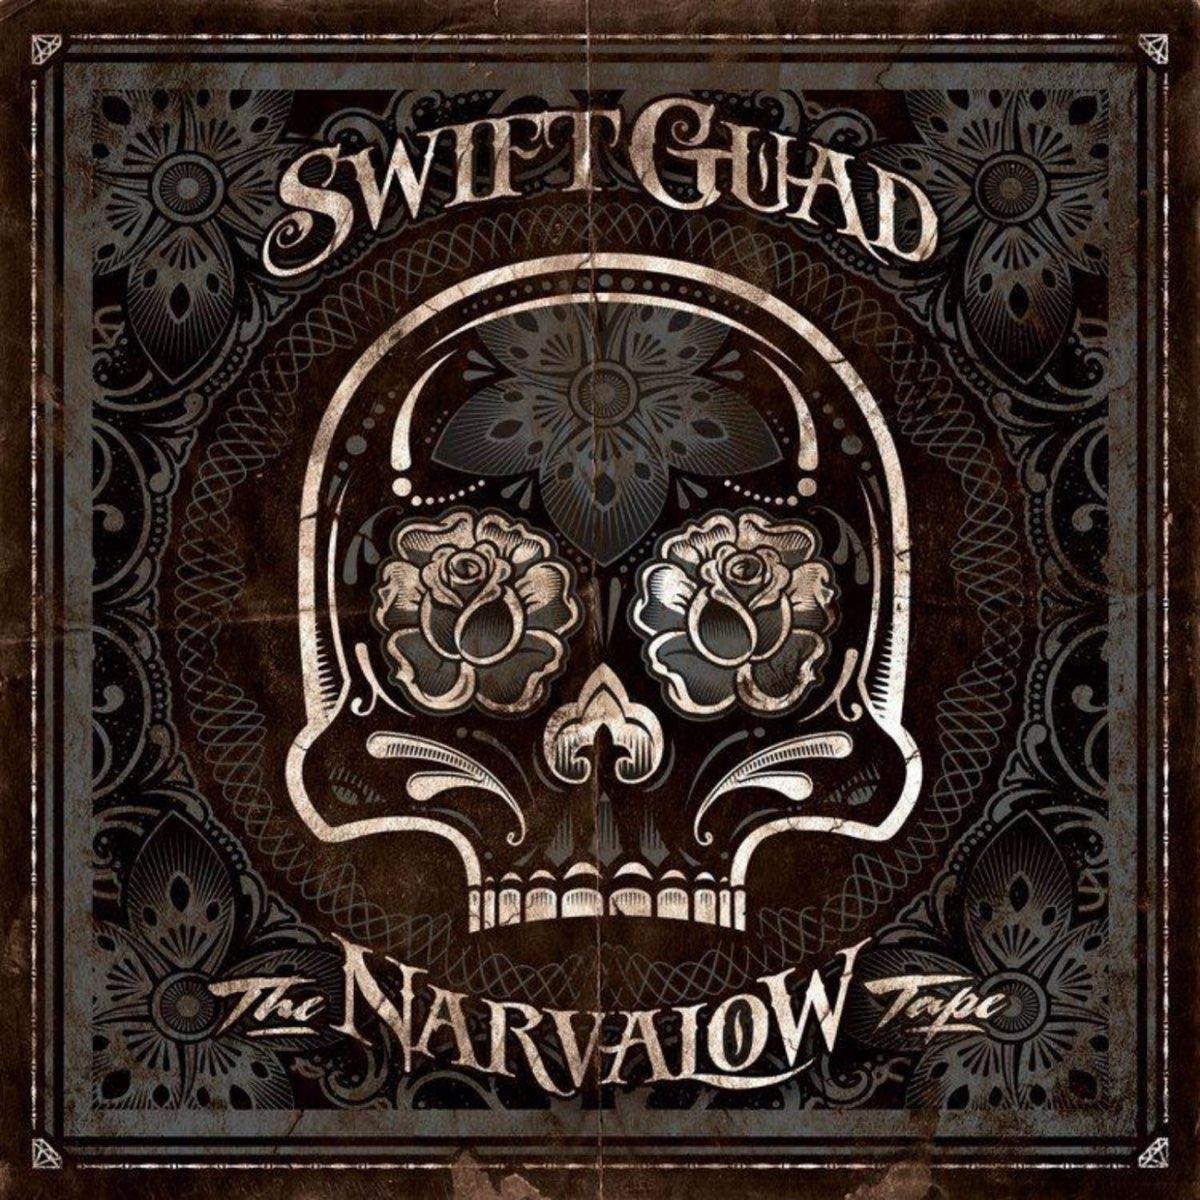 Album Cd Swift Guad - Narvalo Tape de swift guad sur Scredboutique.com